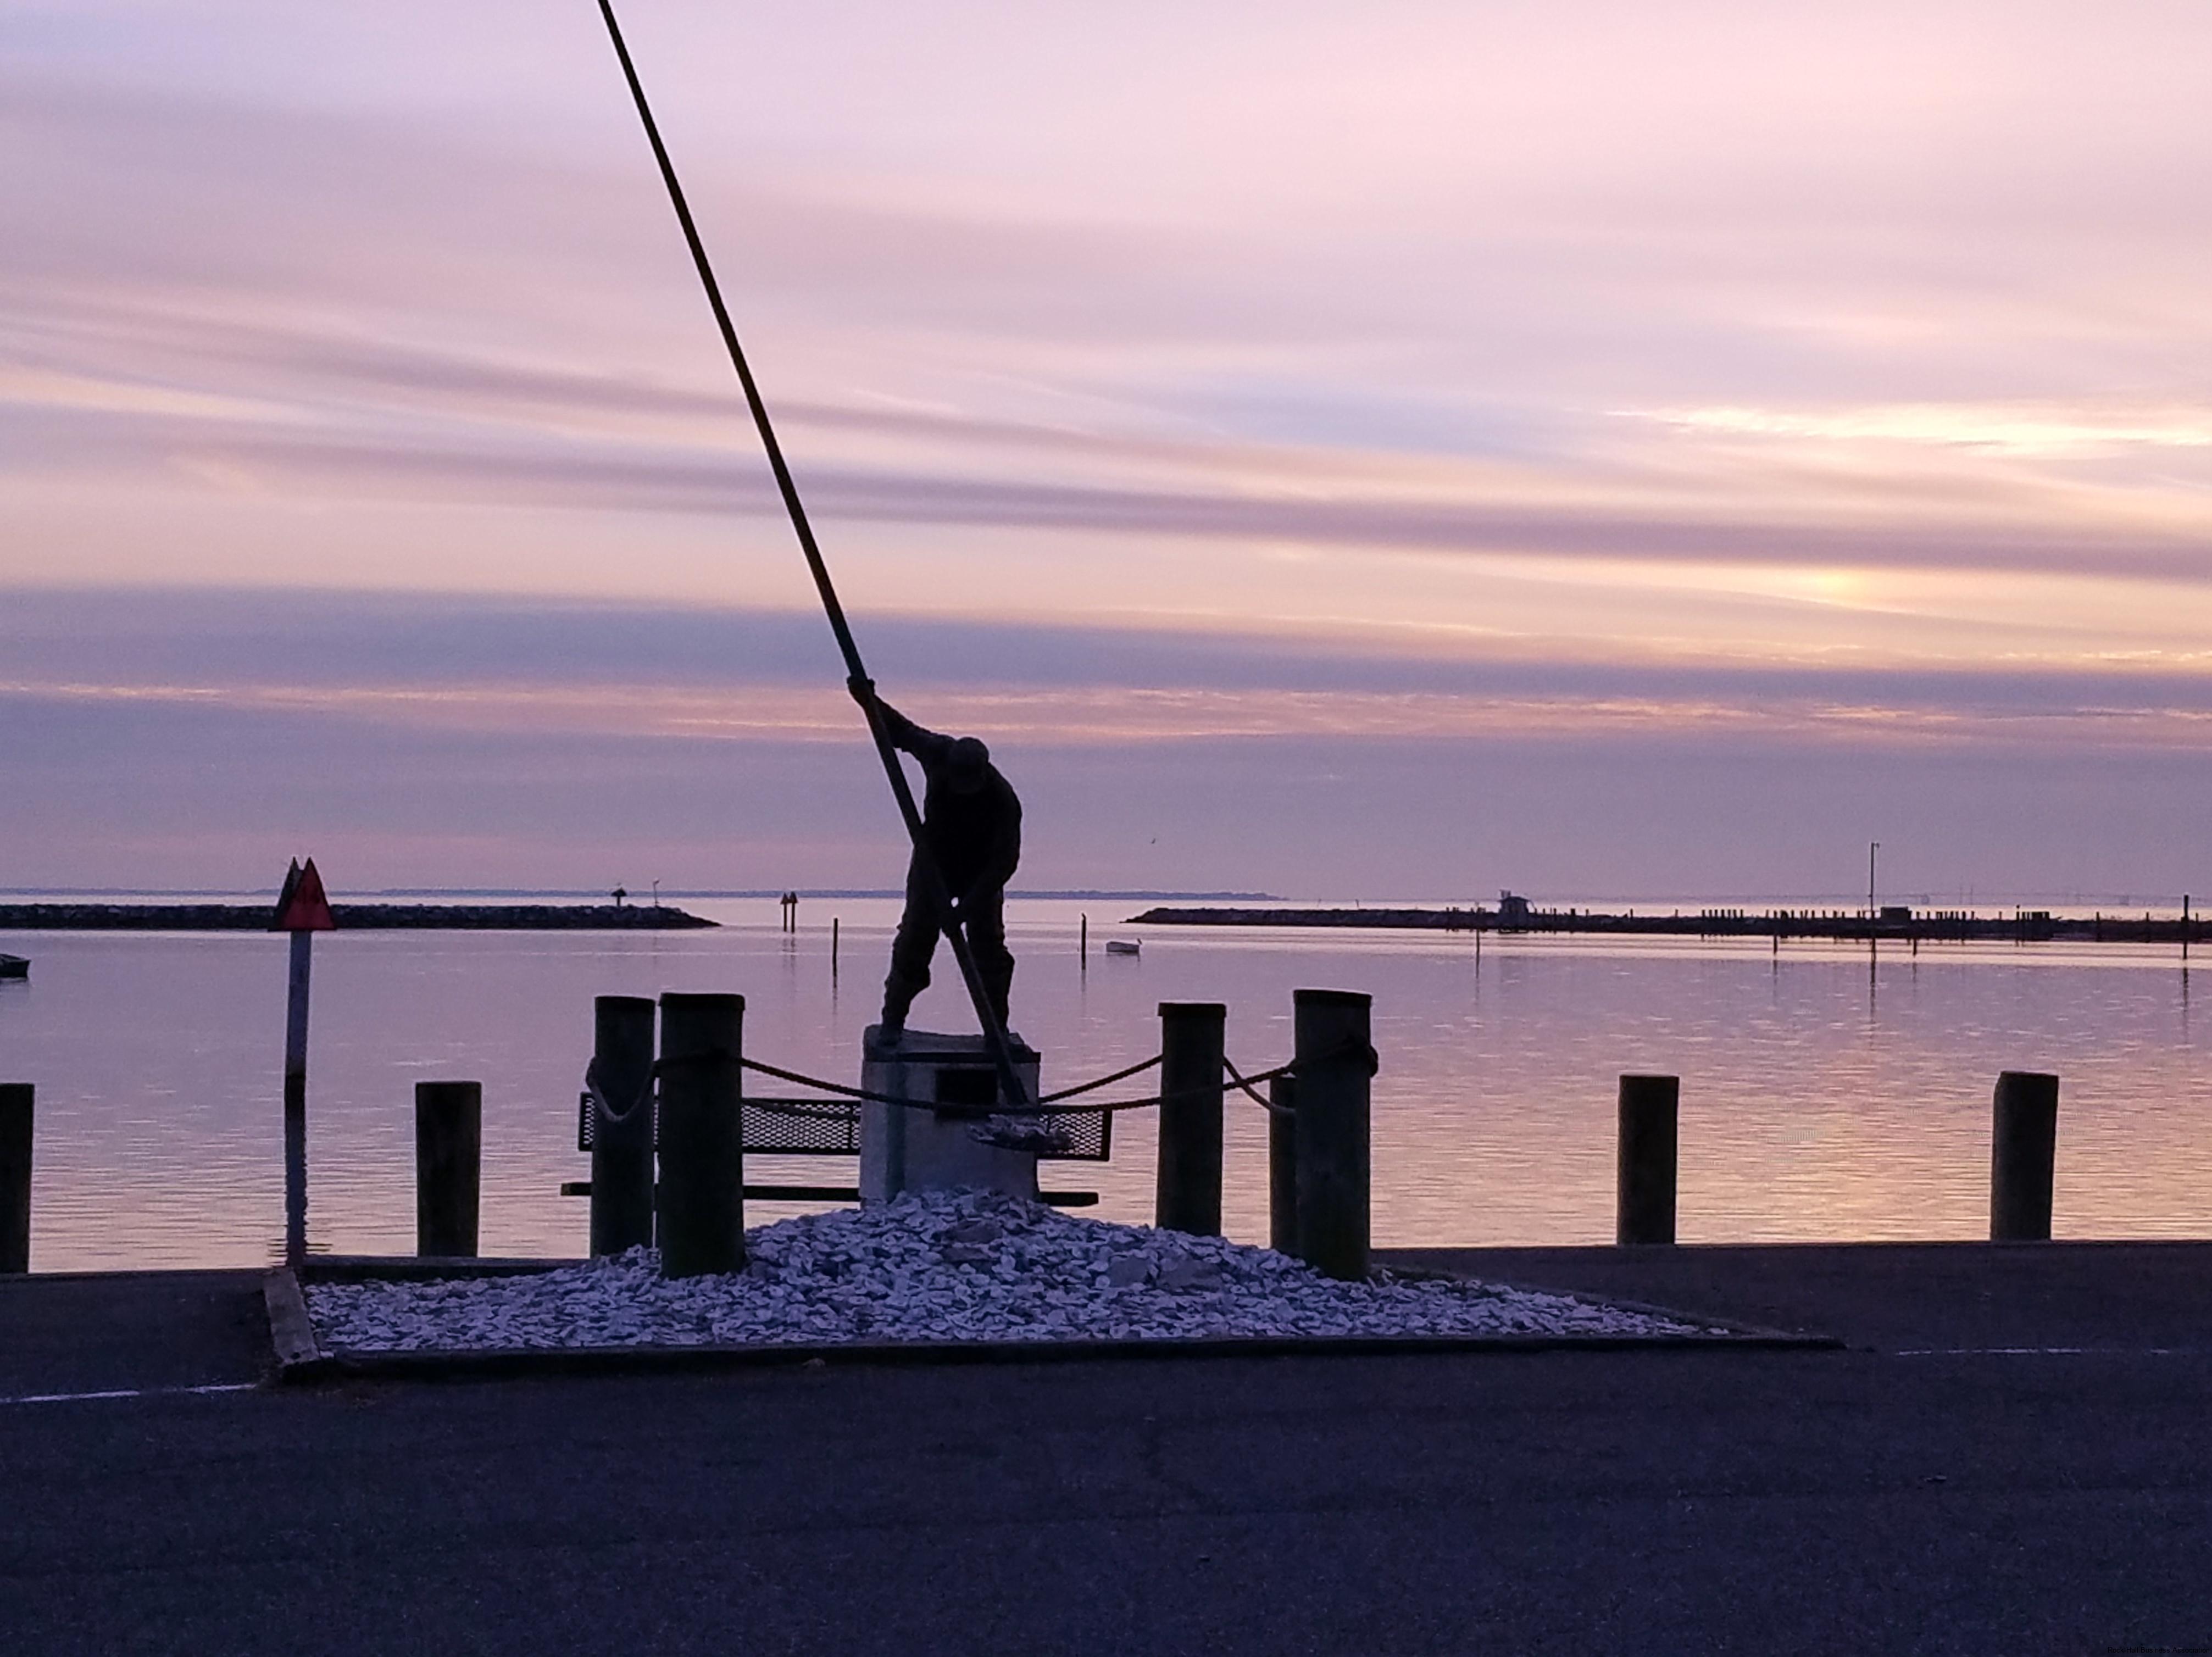 Oysterman-in-Harbor